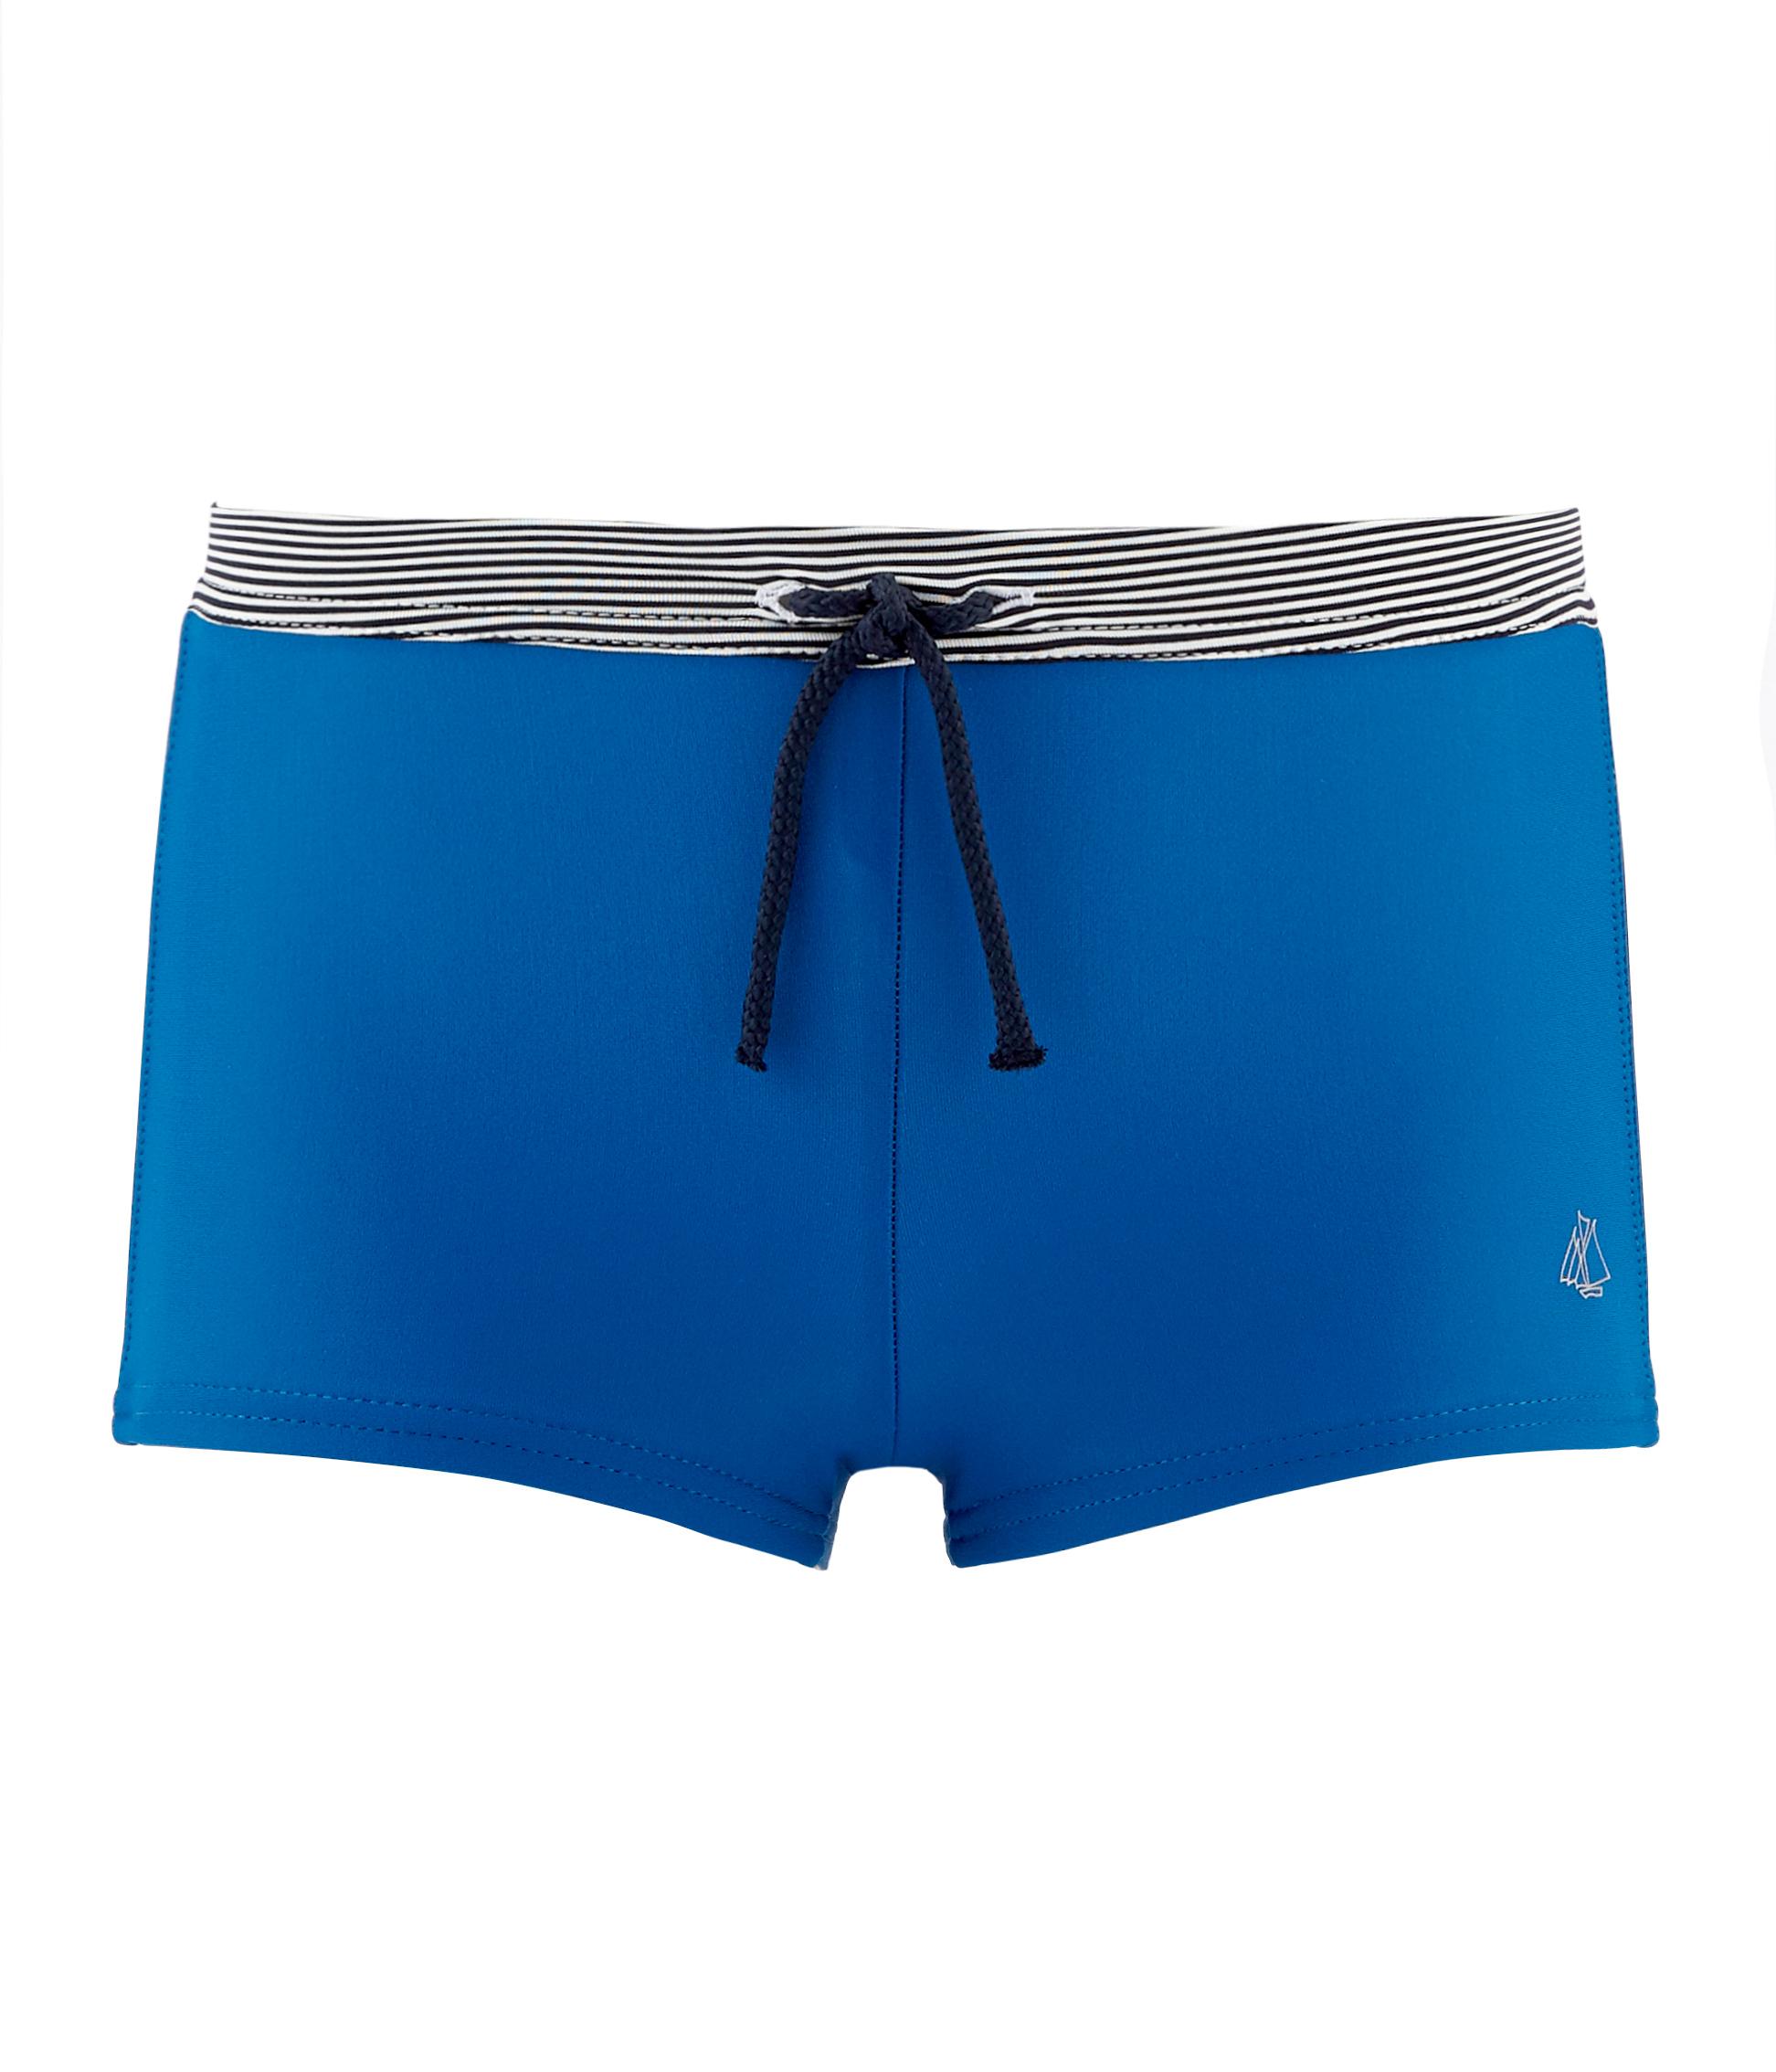 6281b9c4f01a8 Boys' Swimming Trunks | Petit Bateau